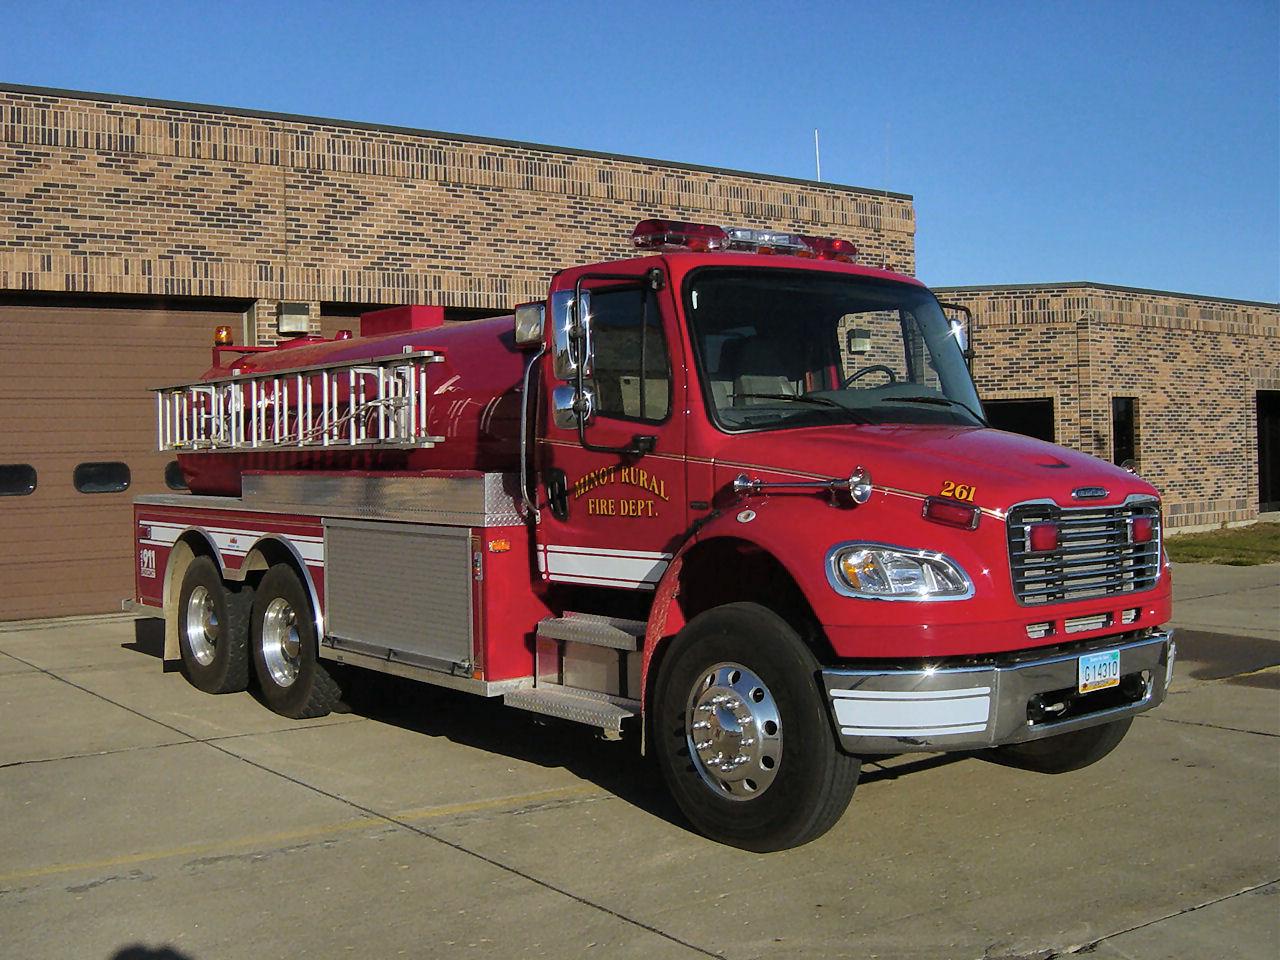 Minot Rural Fire Department - Apparatus